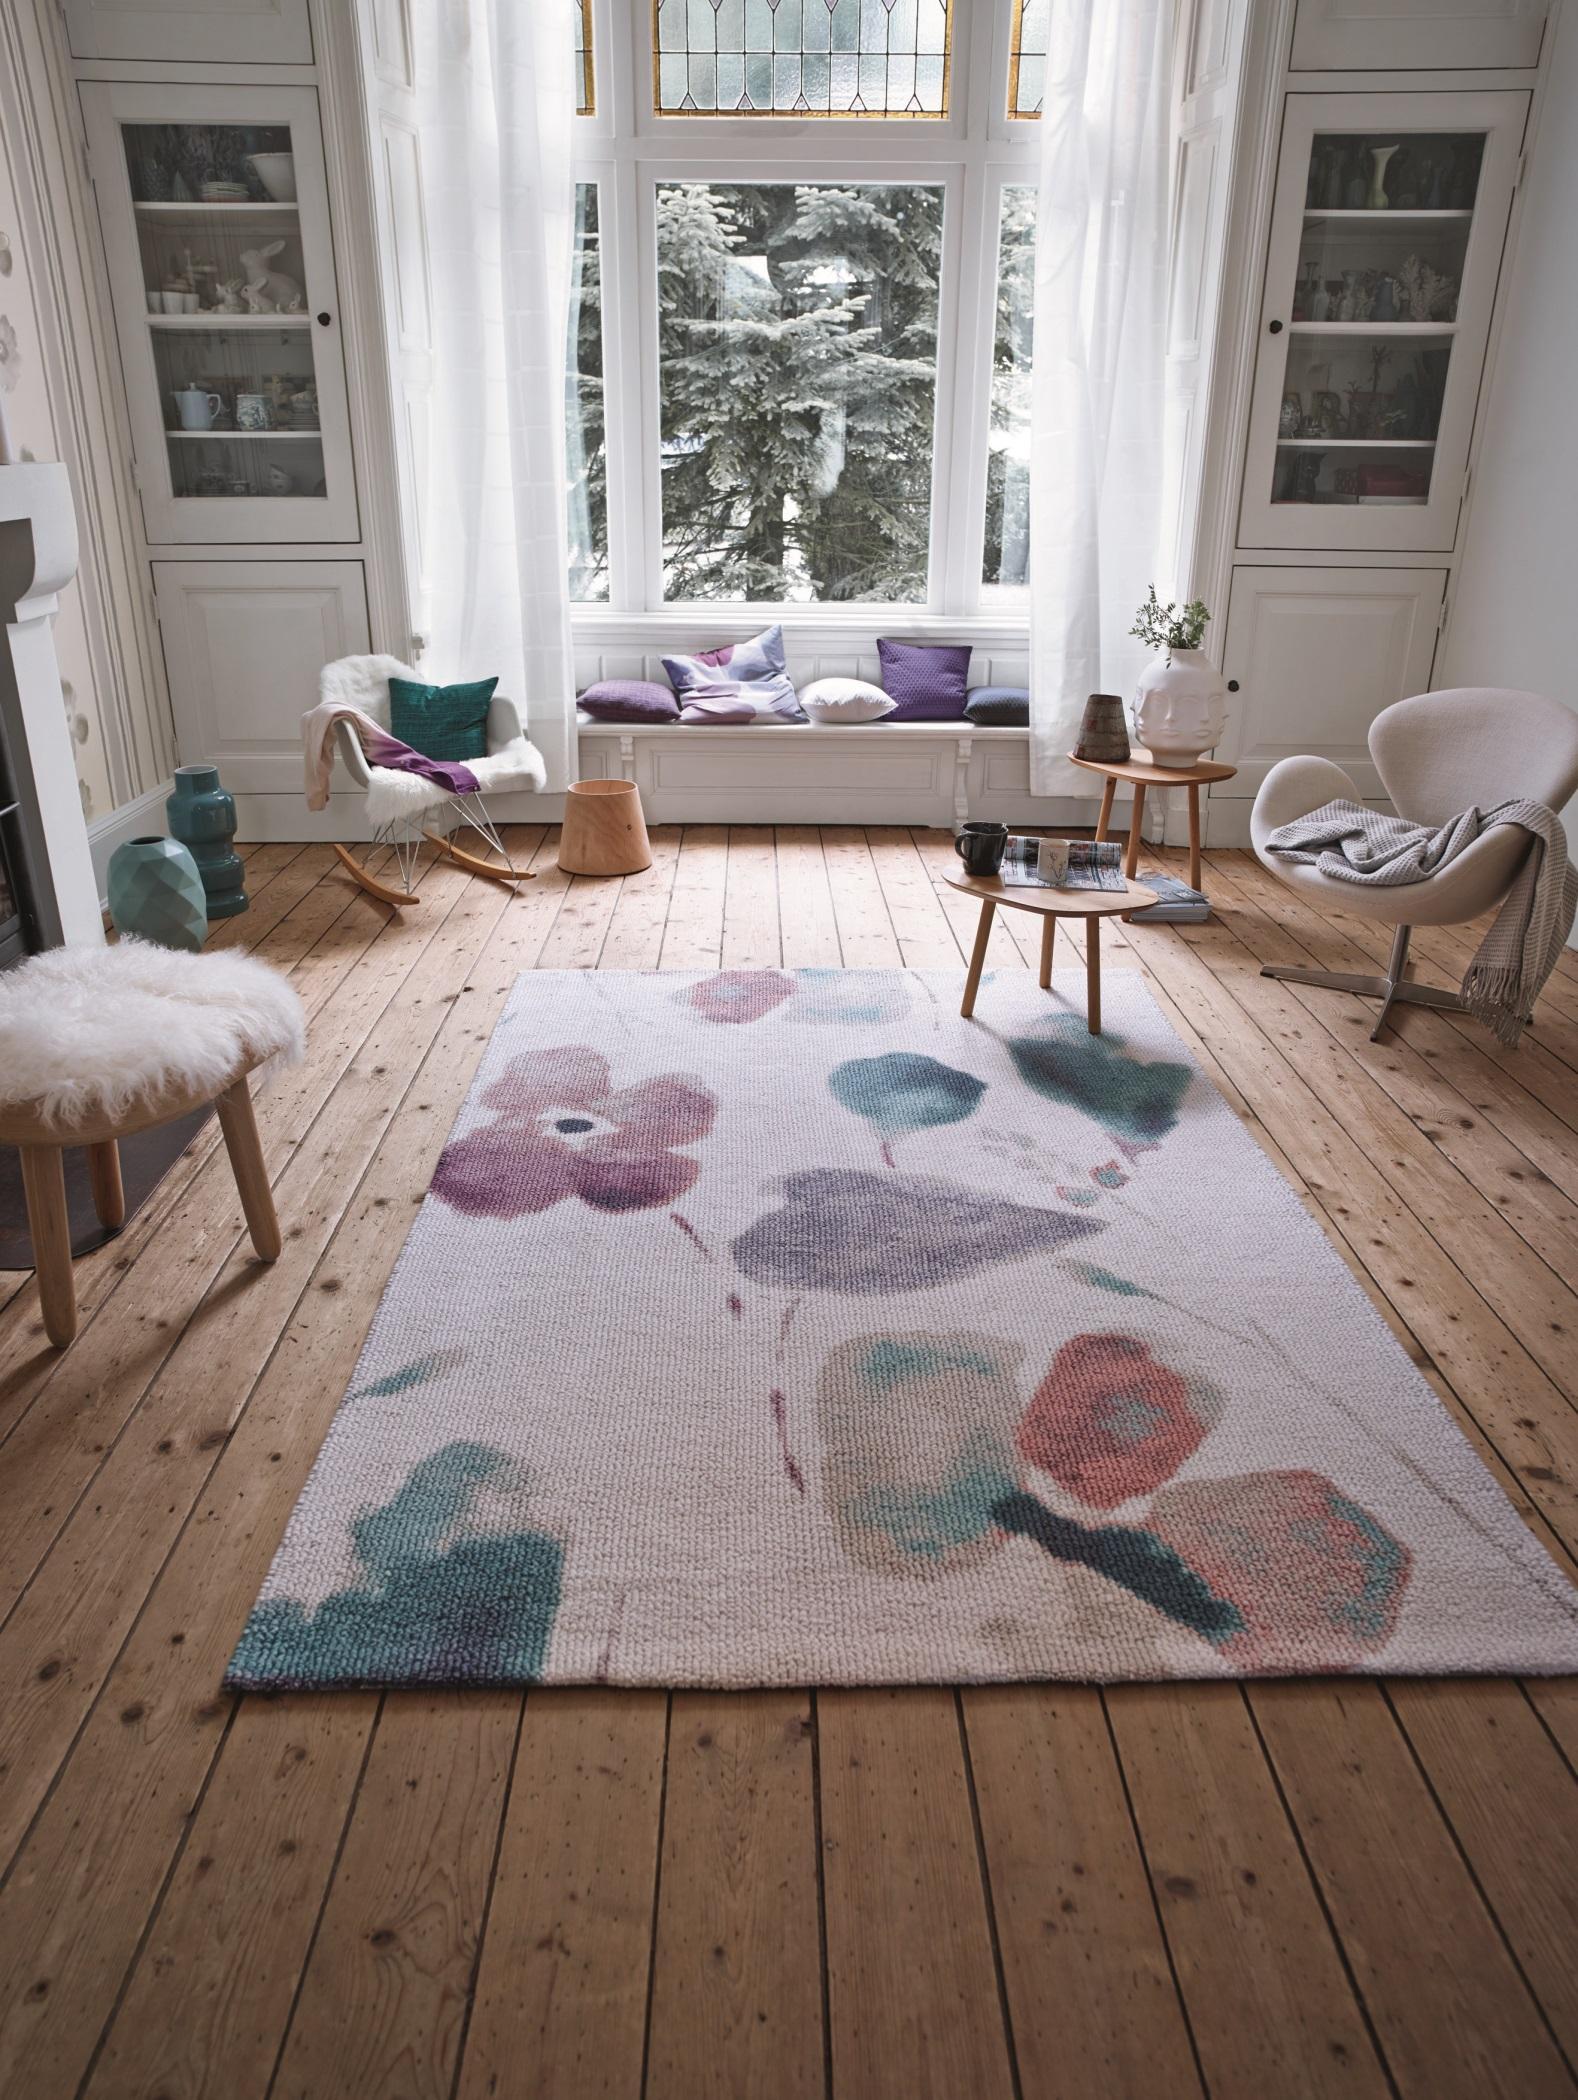 Blumenteppich In Pastellfarben #dielenboden #hocker #teppich #sessel  #kissen #schaukelstuhl #